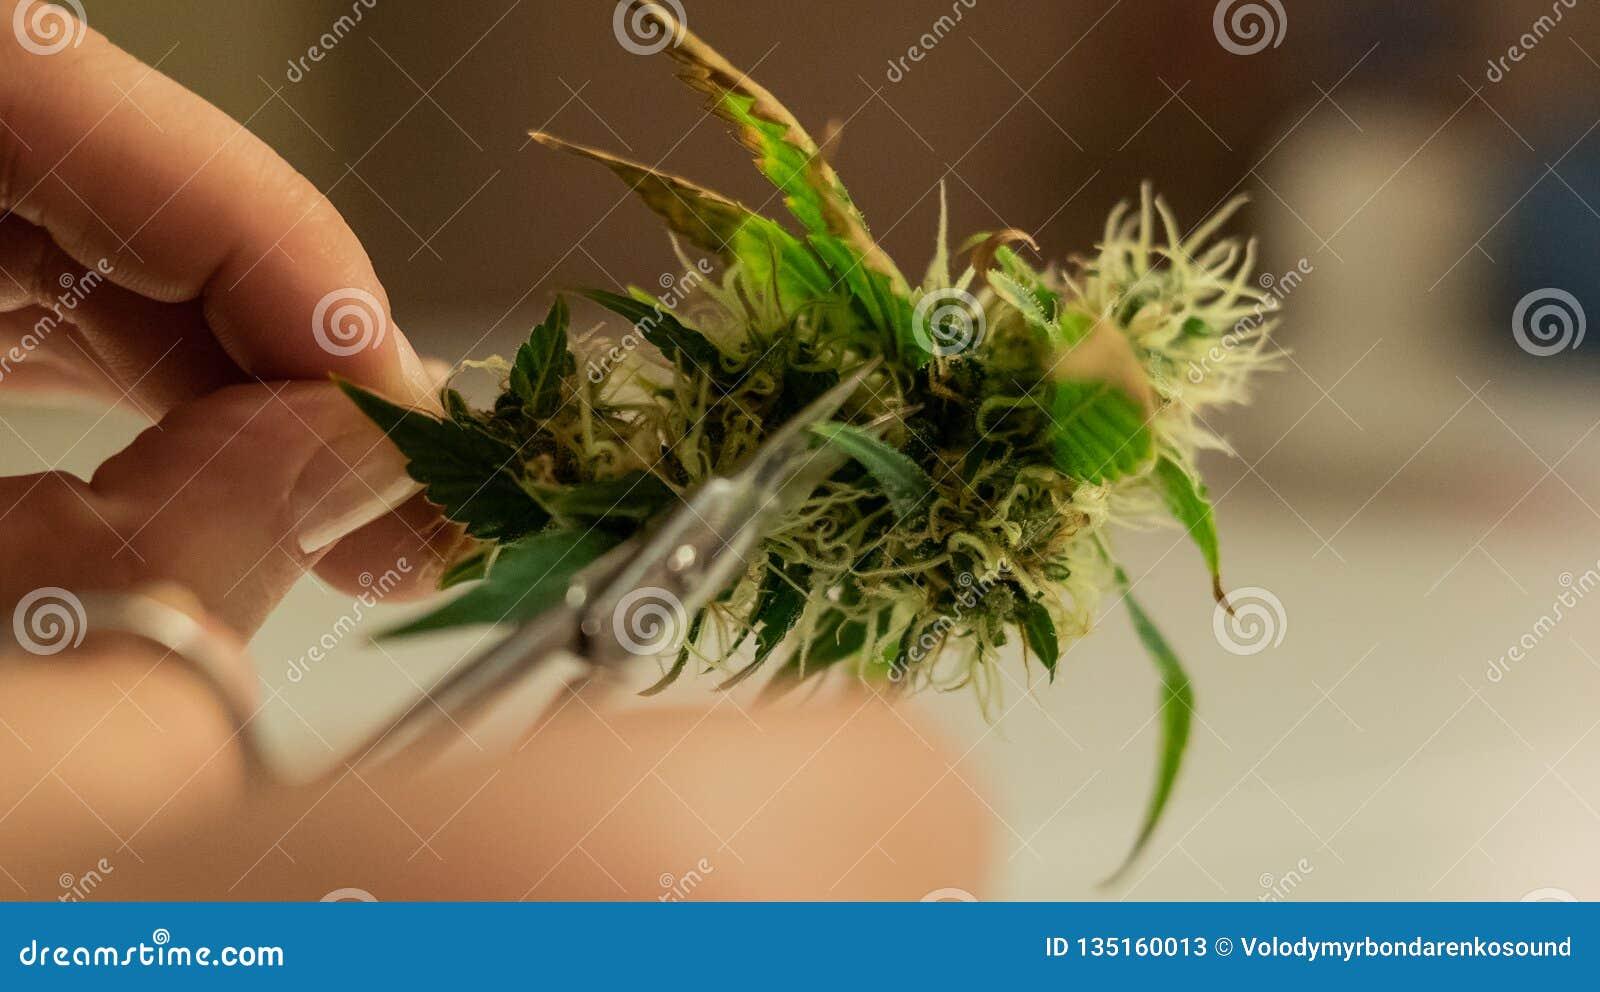 In orde makende marihuanaknoppen in close-up Cannabisspanningen in 2019